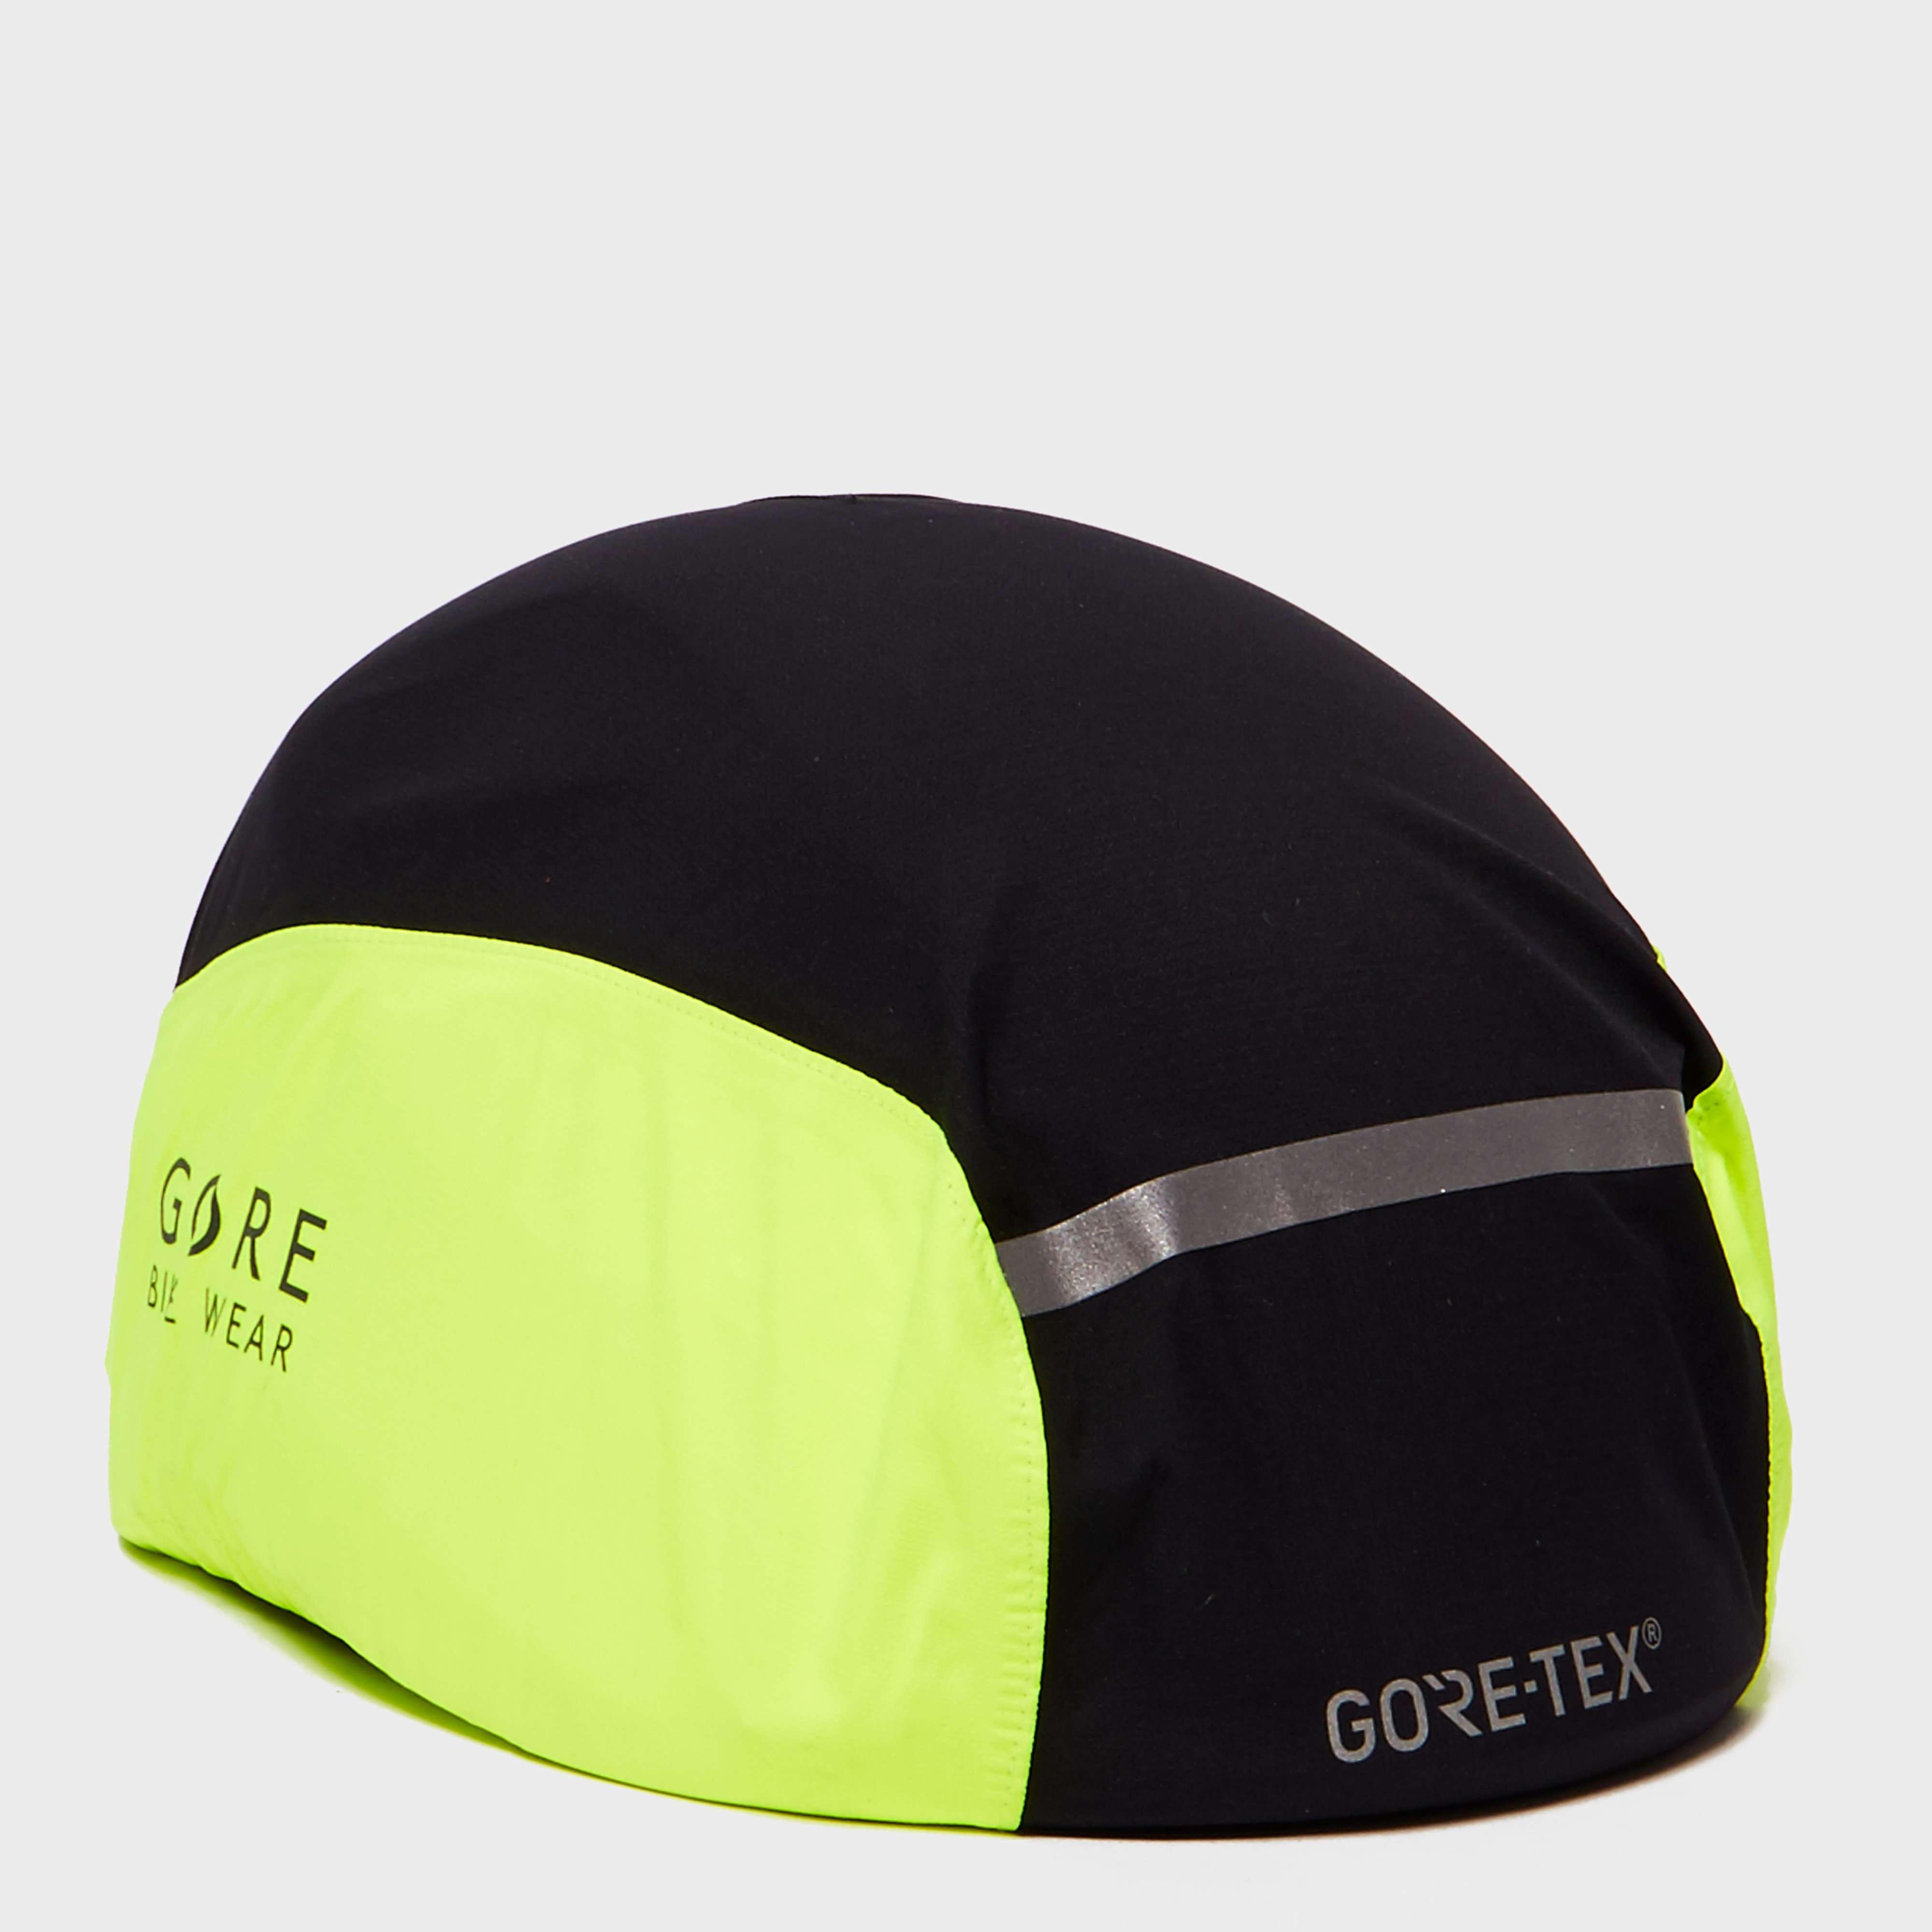 GORE 2.0 Universal Neon GORE-TEX® Helmet Cover